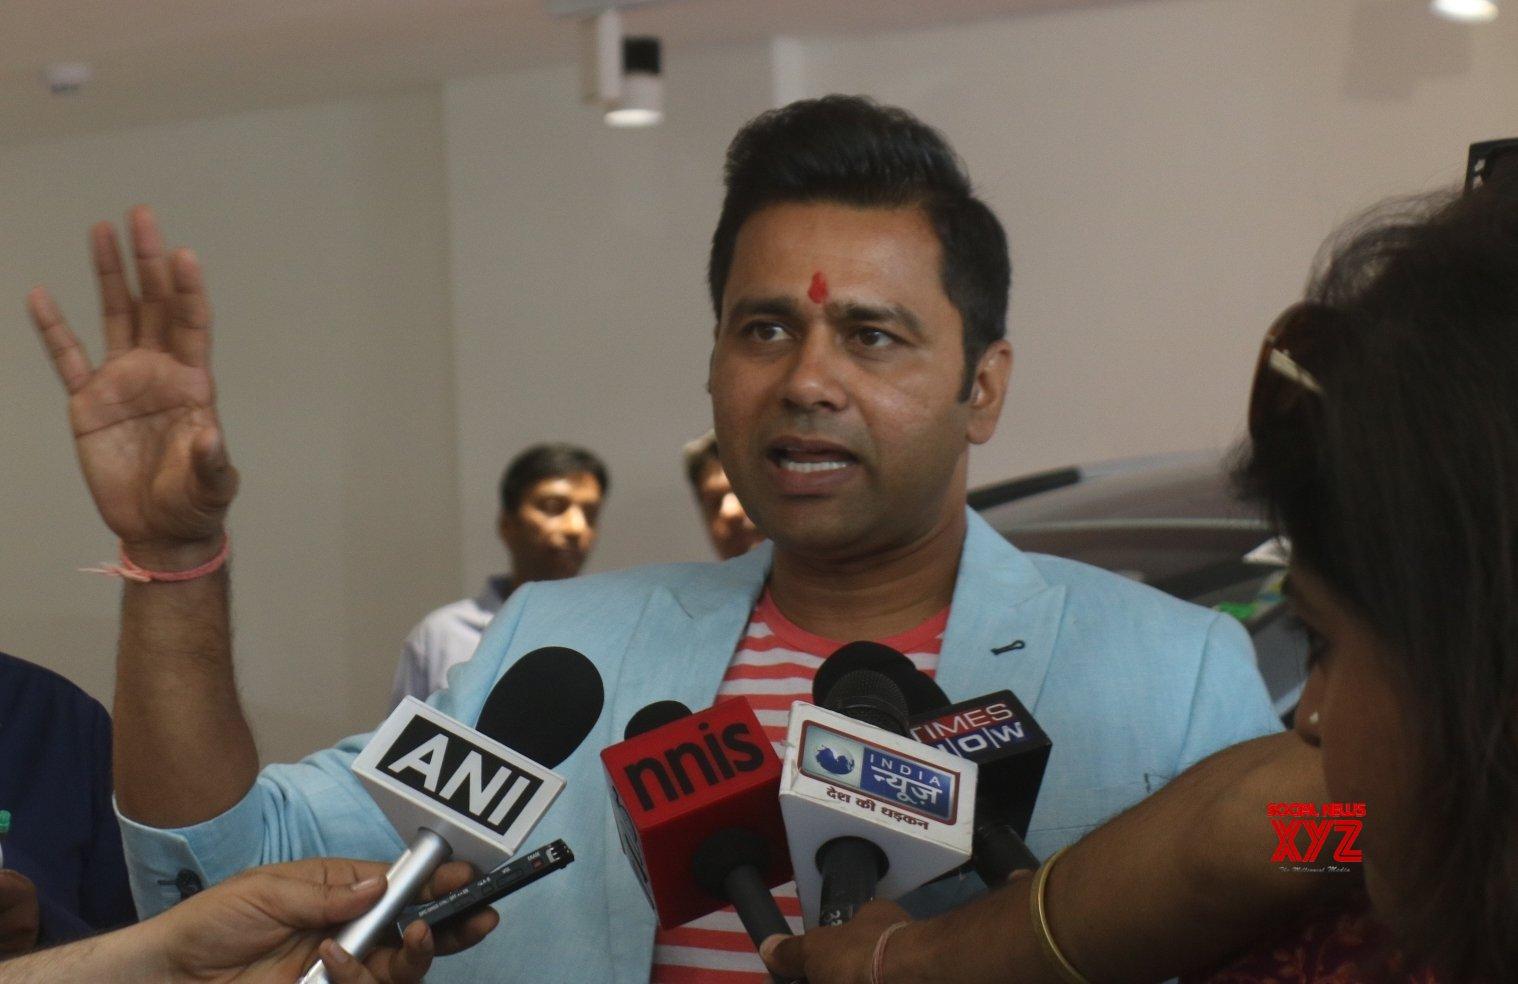 MS Dhoni to lead Aakash Chopra's all-time IPL XI